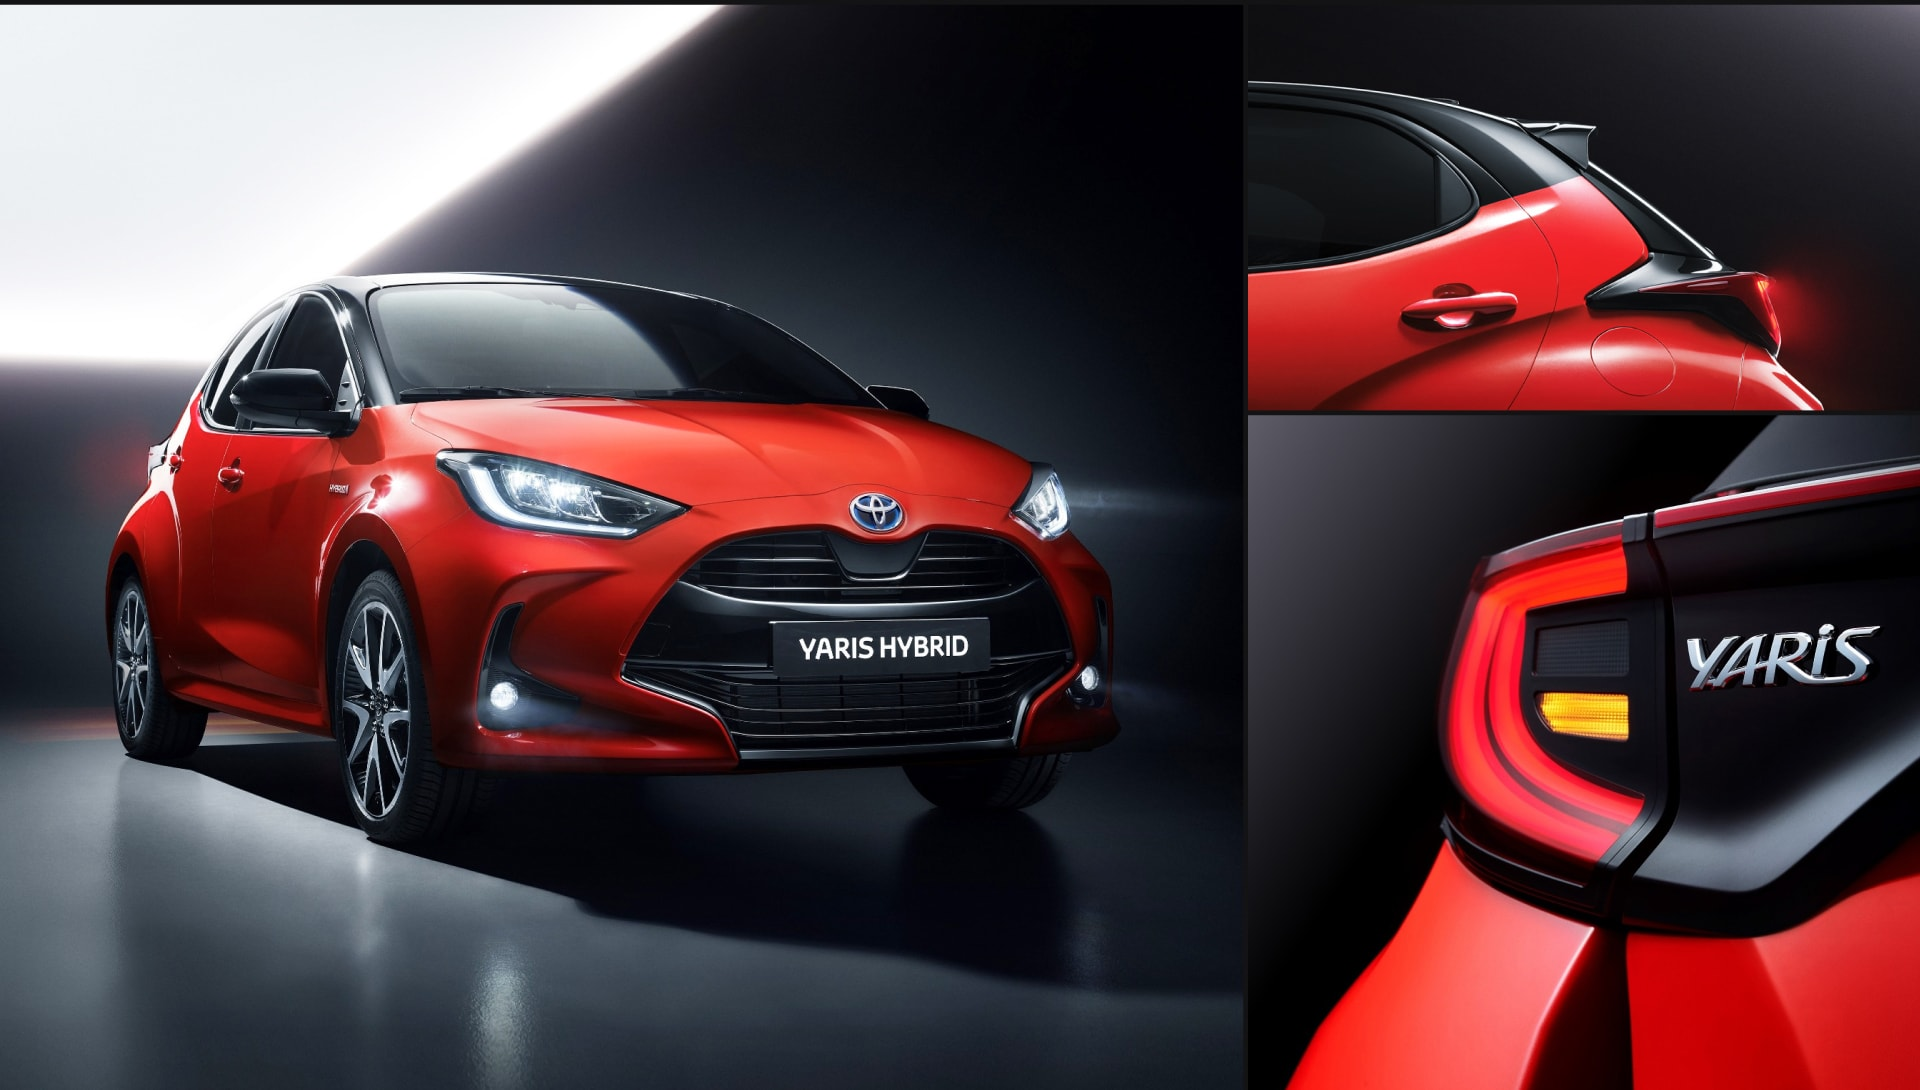 Yaris 2020 Hybrid hatchback exterior in a dark environment. Details of rear & reversing lights.